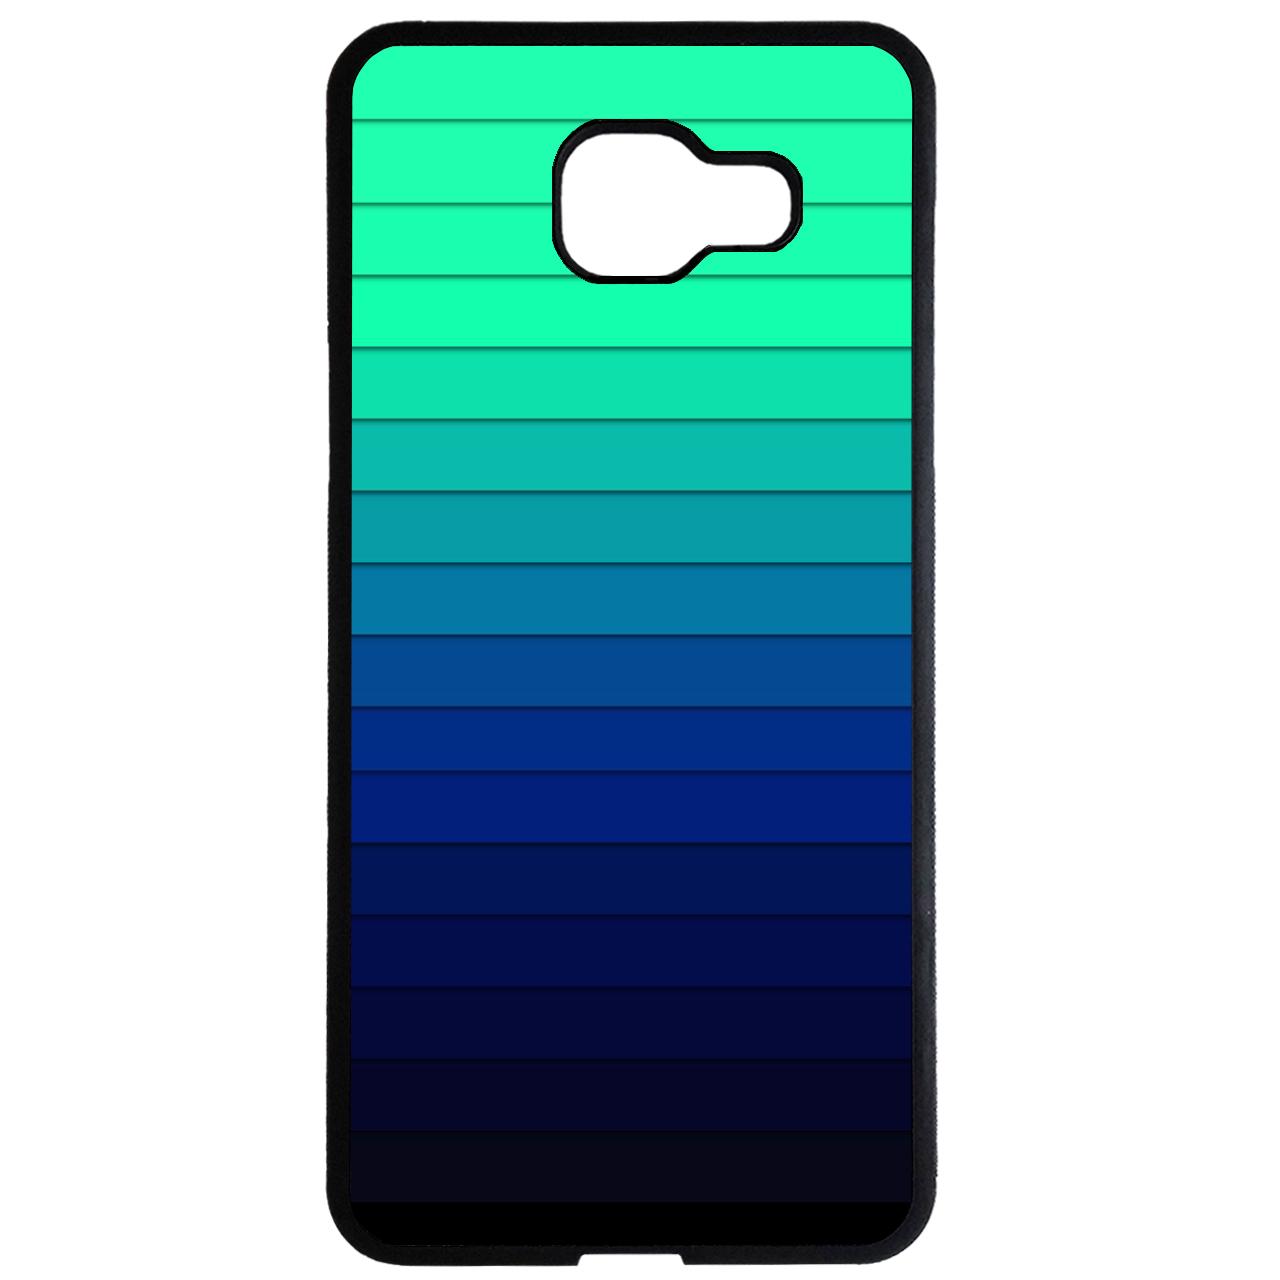 کاور طرح طیف رنگی آبی کد 1105408983 مناسب برای گوشی موبایل سامسونگ galaxy a7 2016